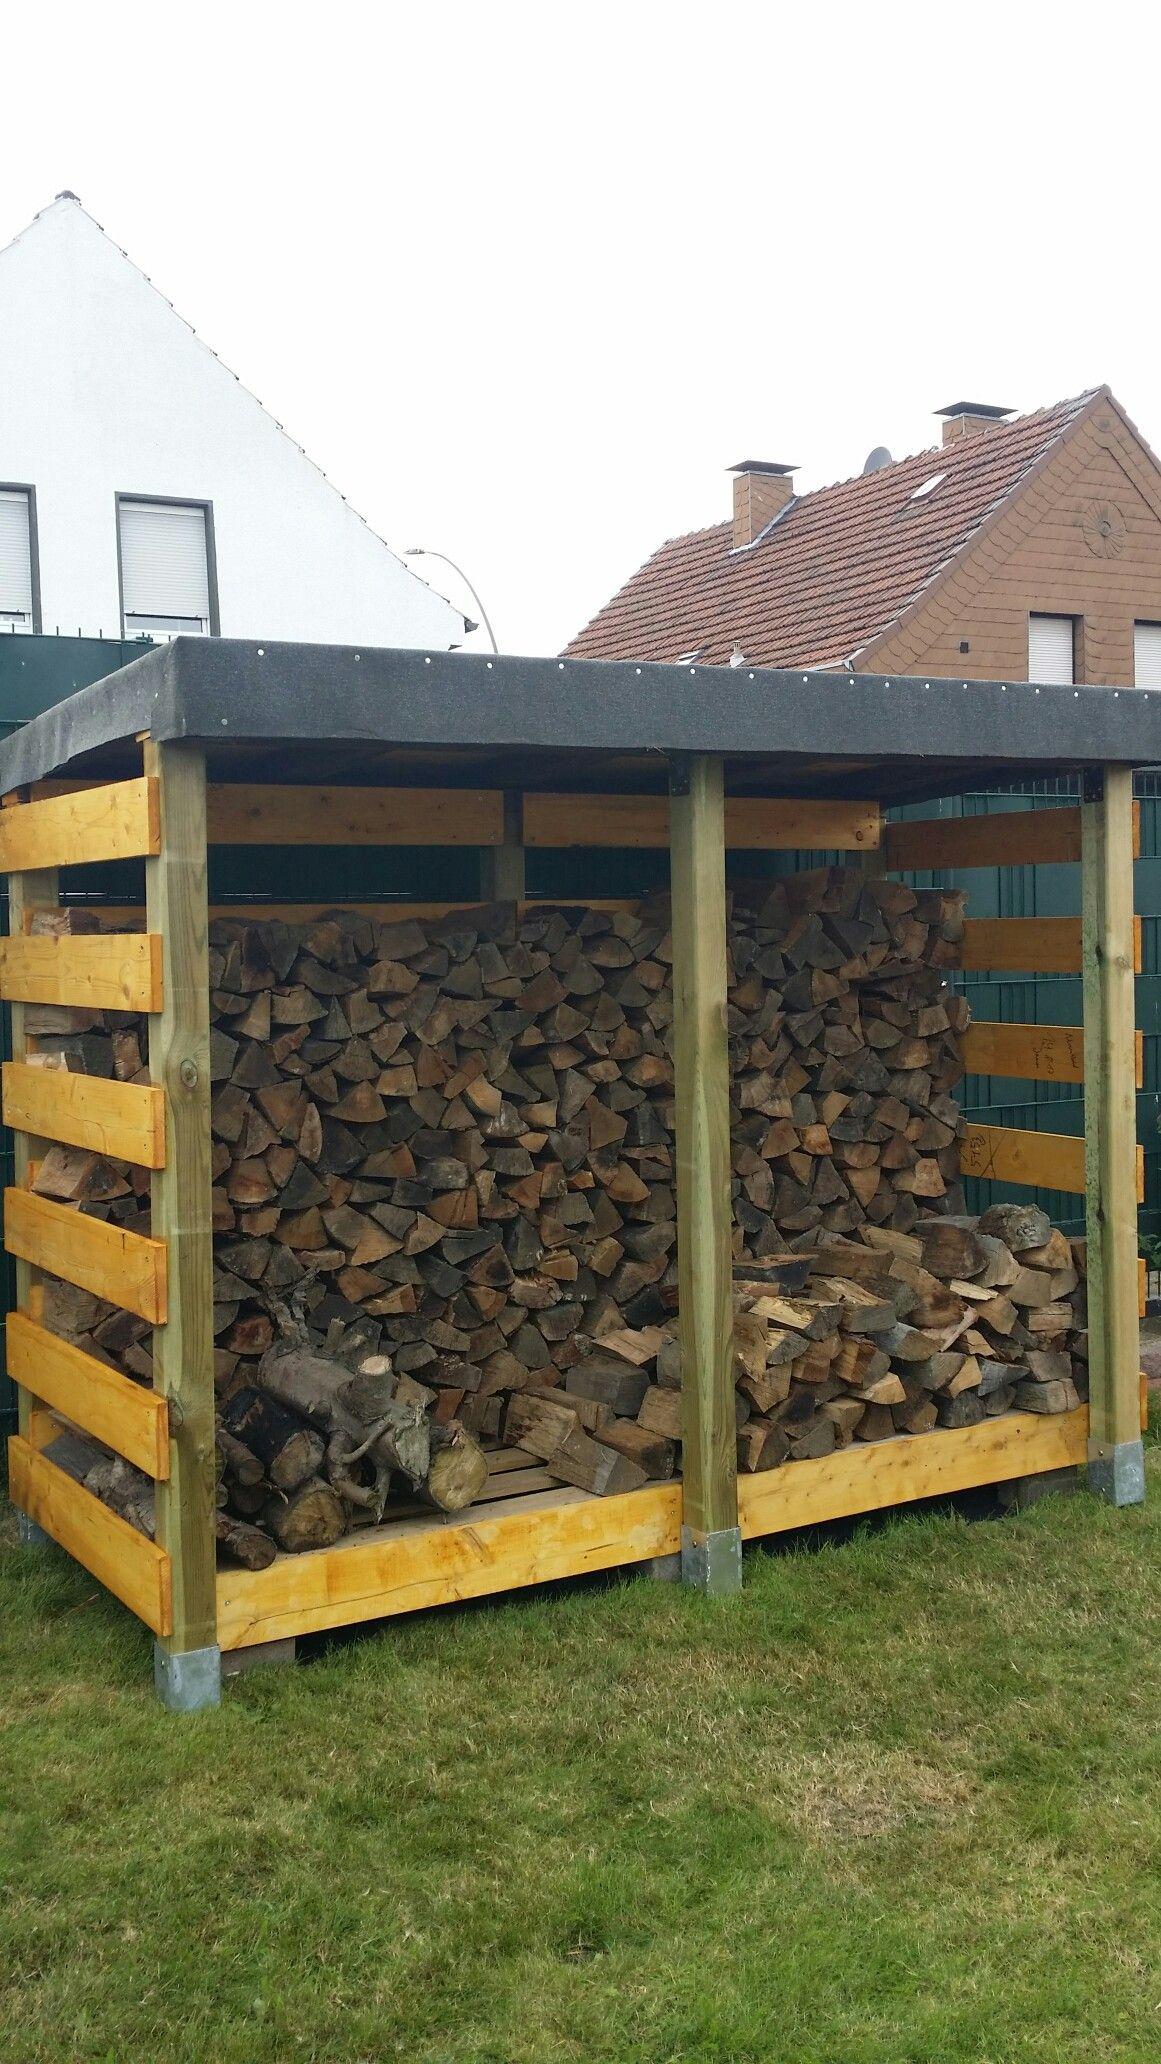 Kaminholzunterstand  KAMINHOLZUNTERSTAND DIY | Záhradná architektúra | Pinterest